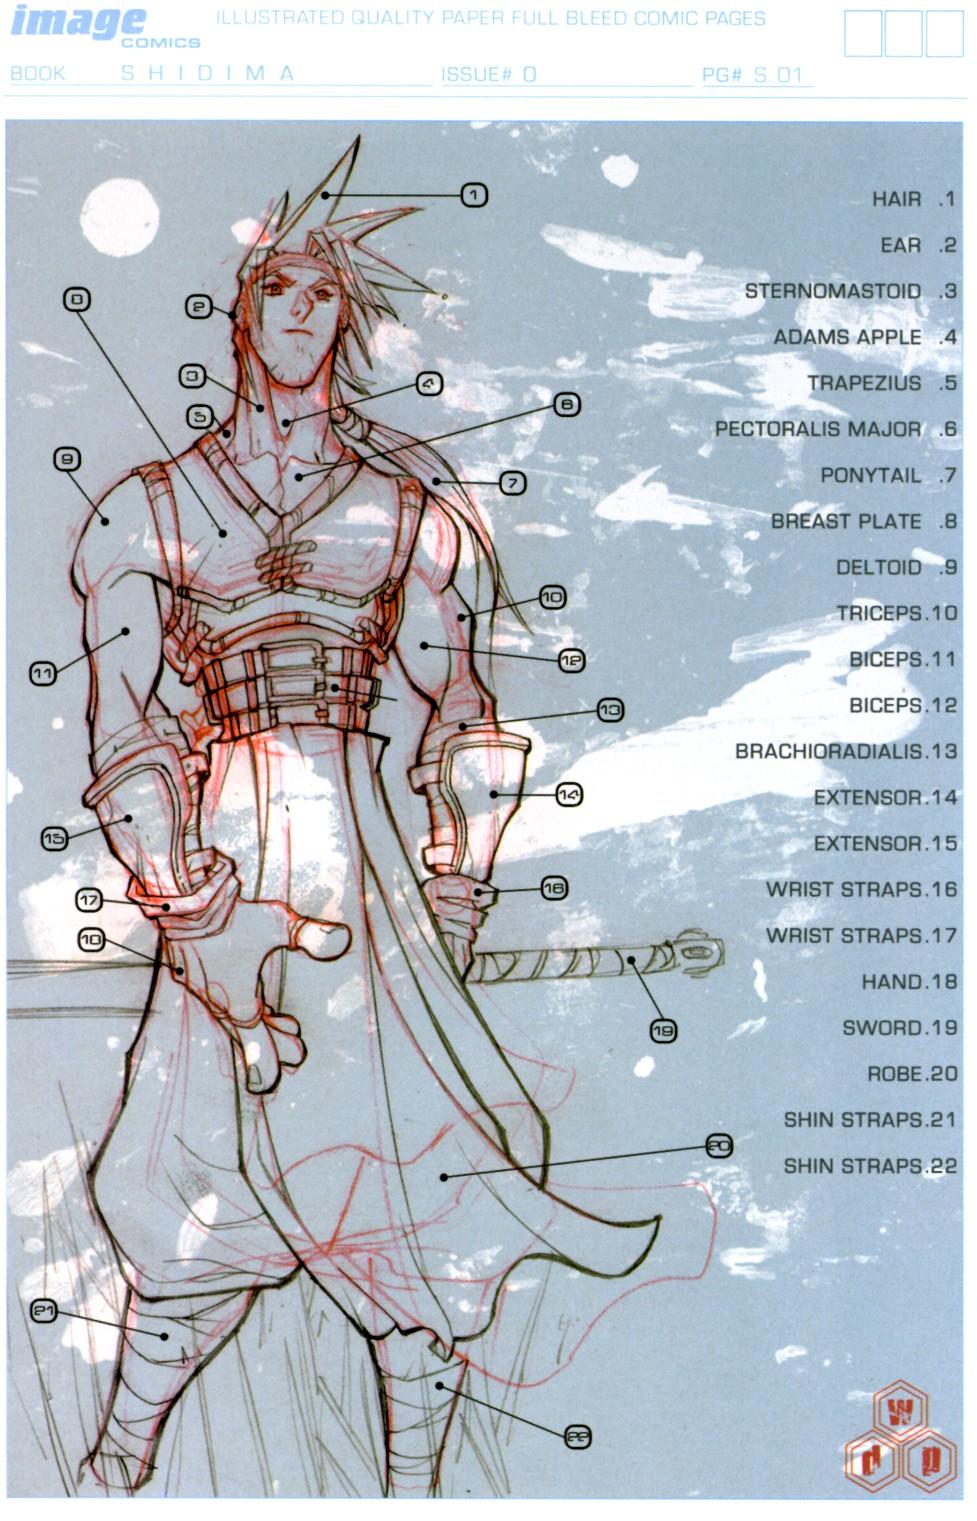 Read online Shidima comic -  Issue #0 - 14